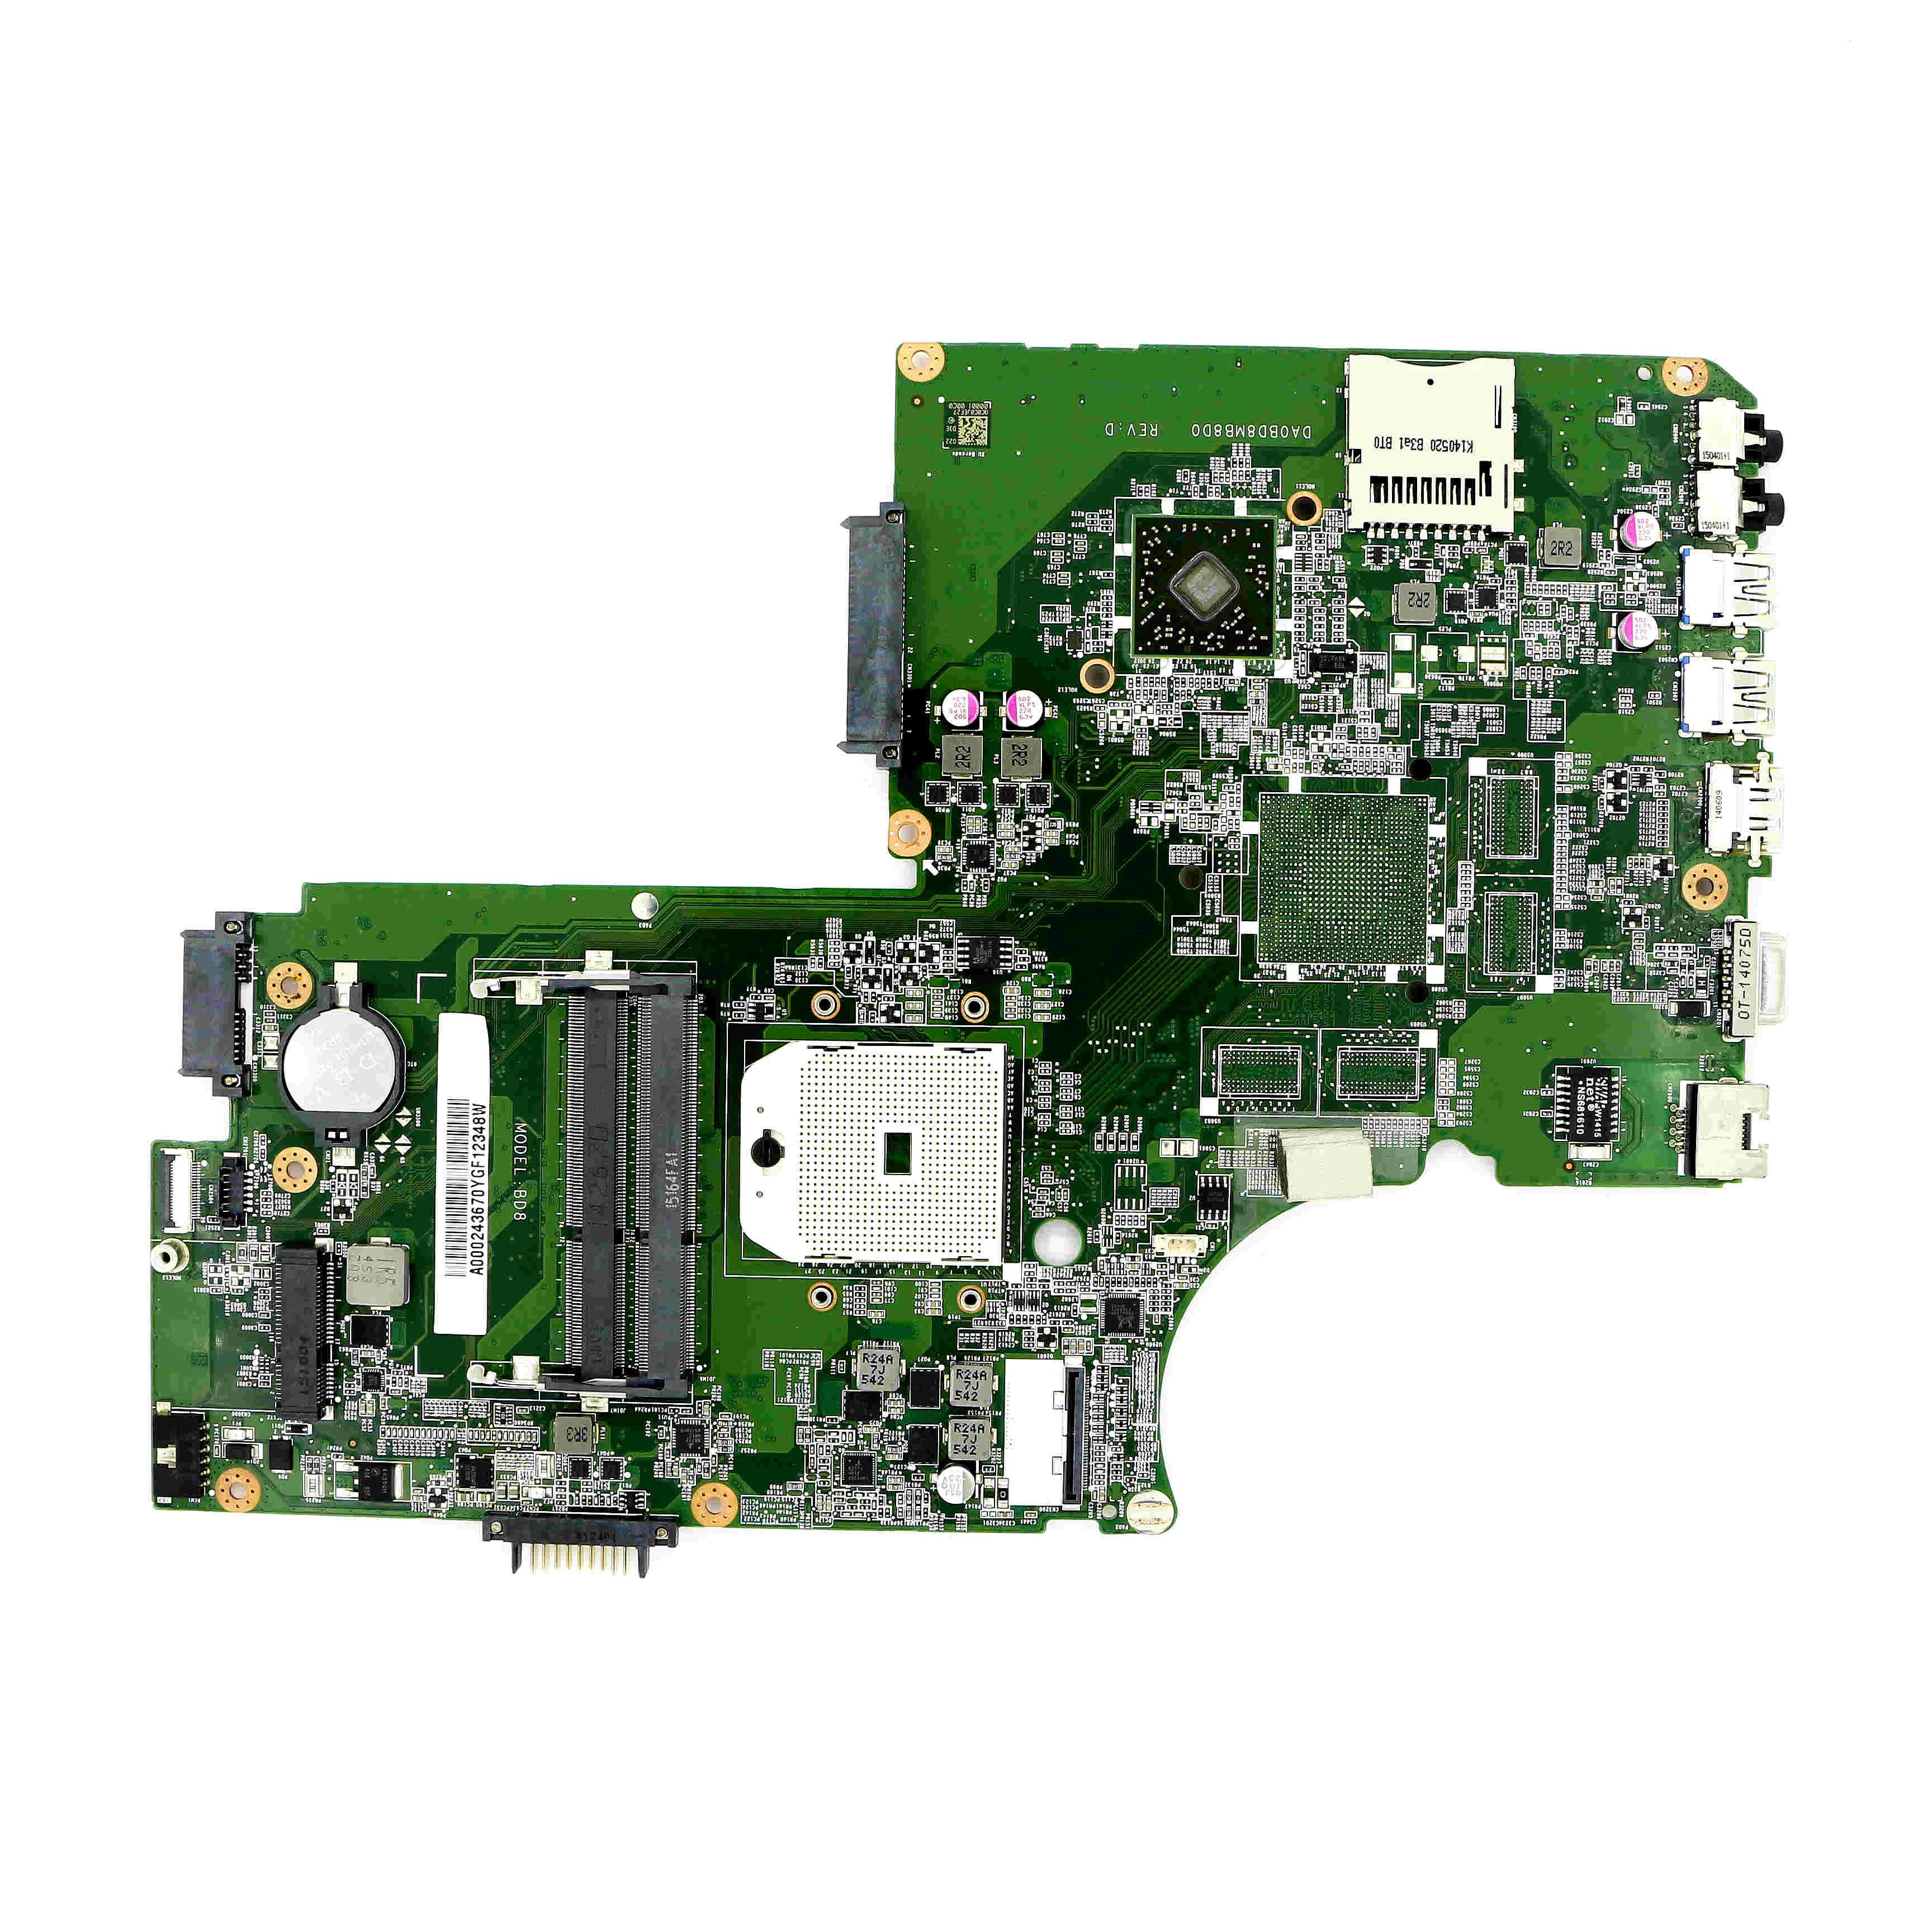 A000243670 - UMA FS1 MOTHERBOARD DA0BD8MB8D0 For TOSHIBA SATELLITE L75D-A